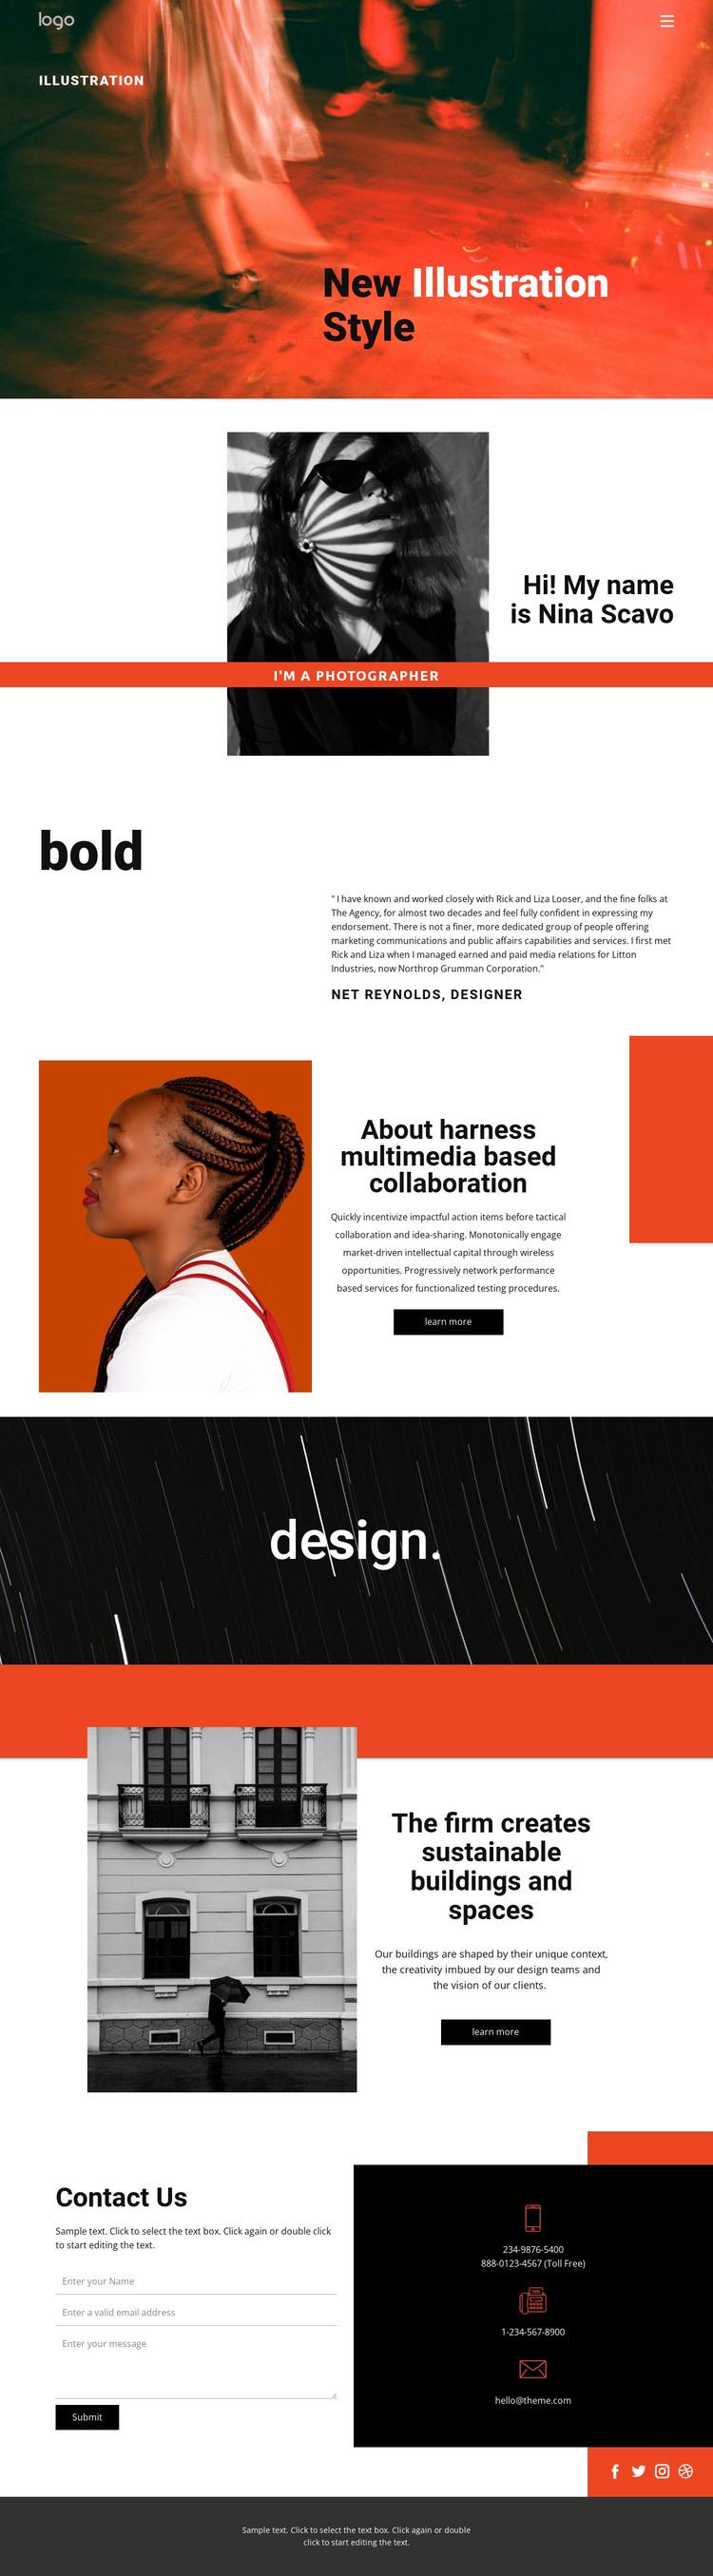 Illustration styles for art  HTML Template